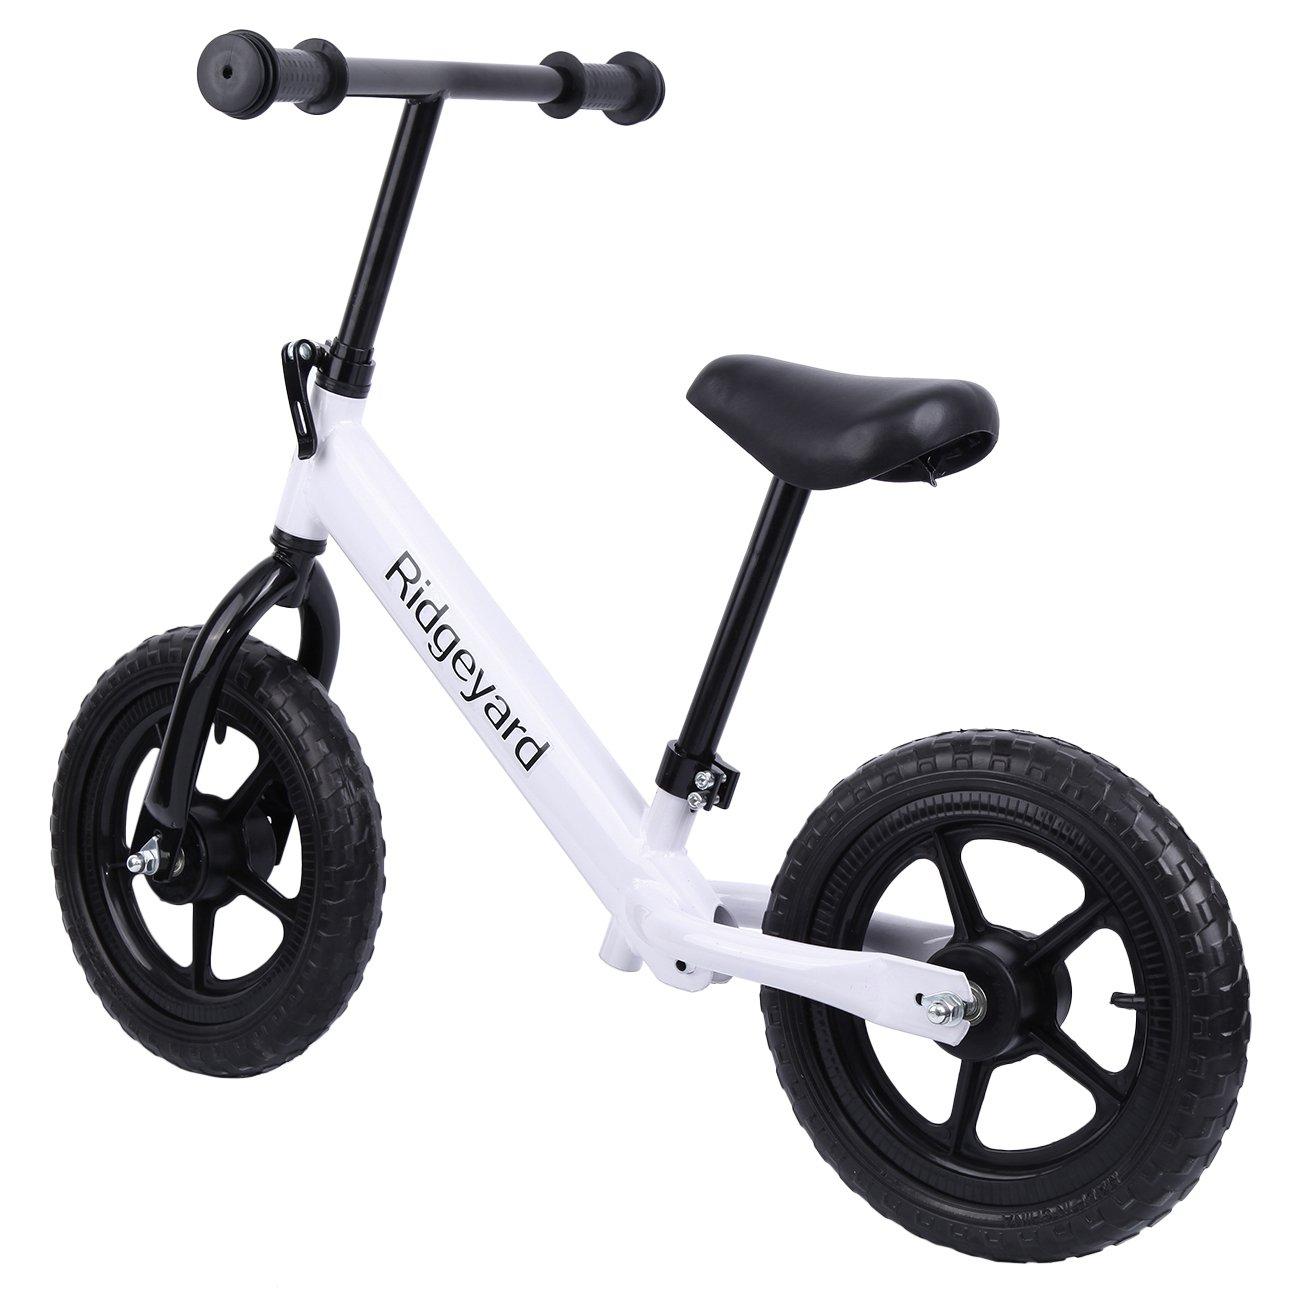 Ridgeyard 12'' No-Pedal Balance Bike Walking Bicycle for Kids Age 2-6 with Adjustable Seat and Handle Height